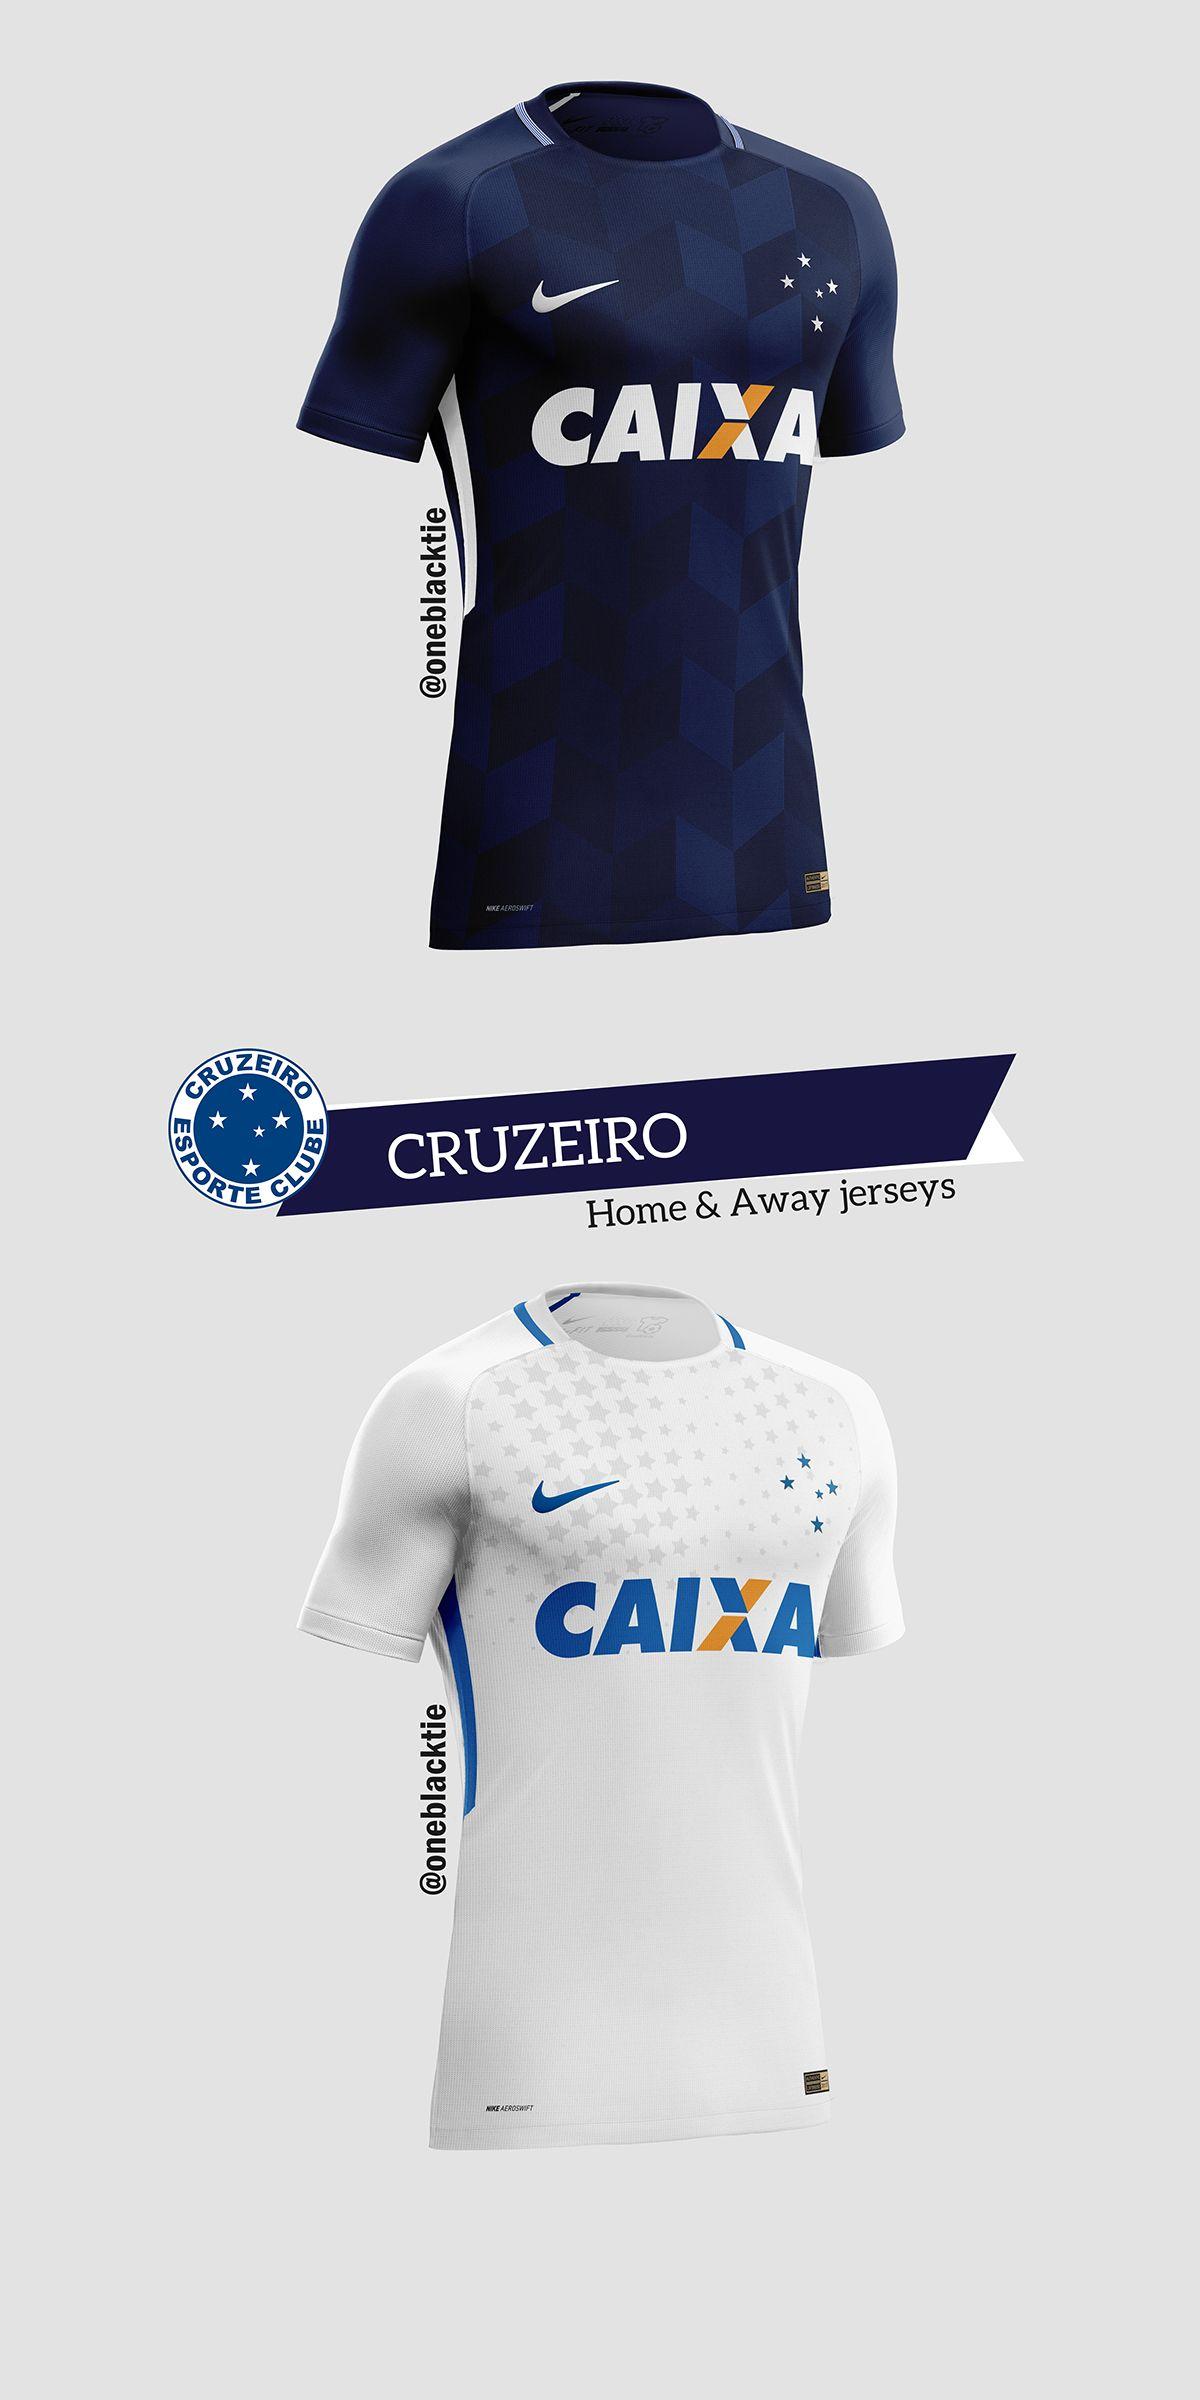 37543aca58 Nike Brasileirão Série A 2017 Concept Jerseys on Behance